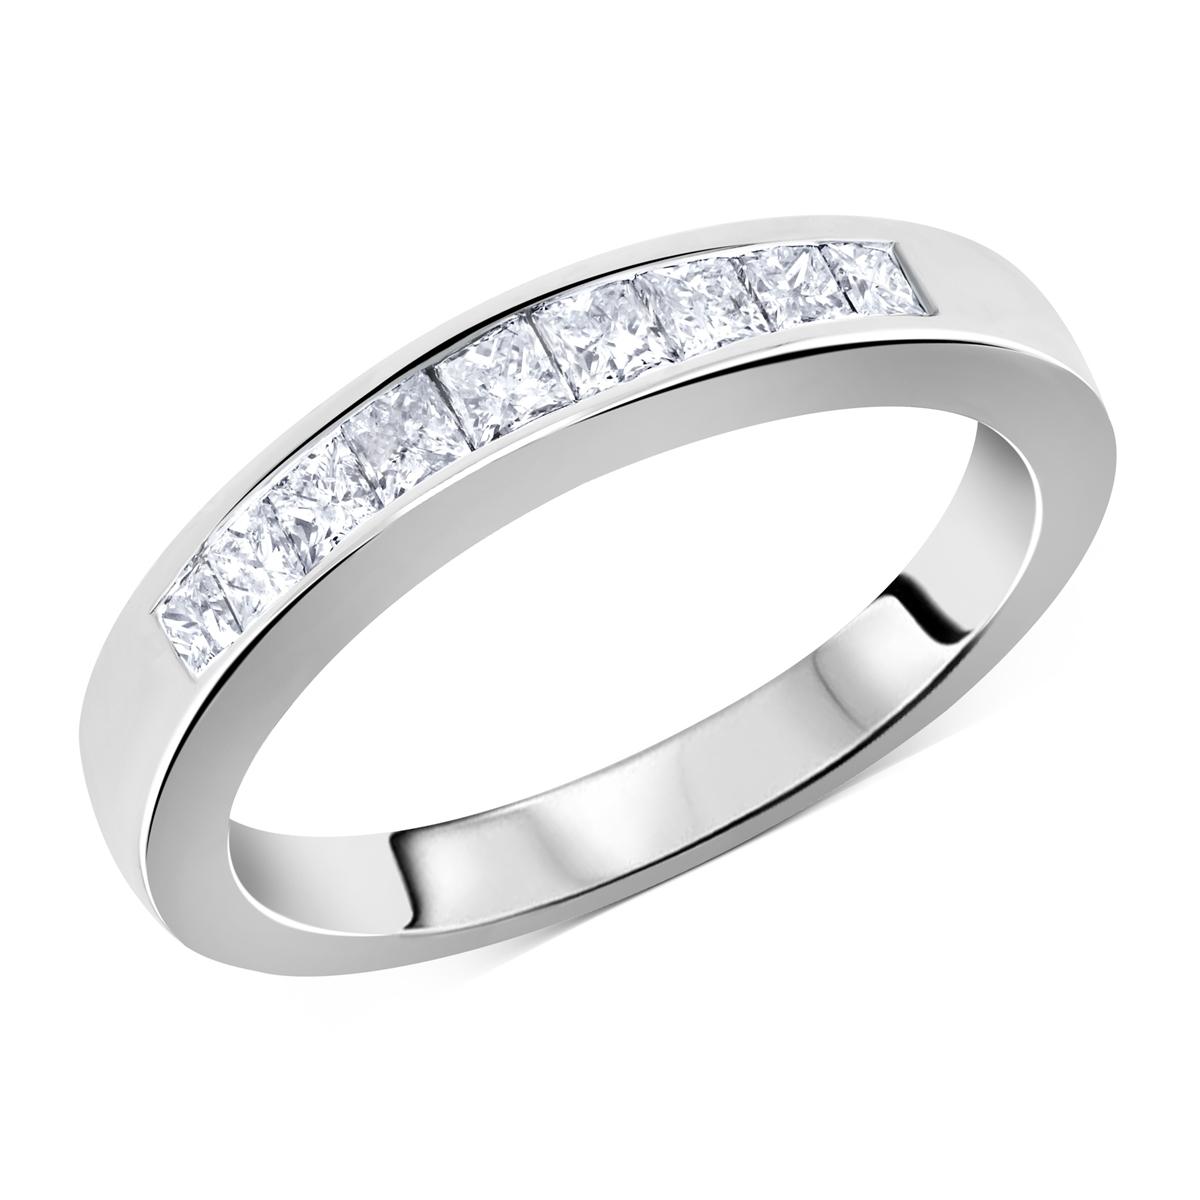 Matching Diamond Wedding Band Channel Invisible Set Princess Cut